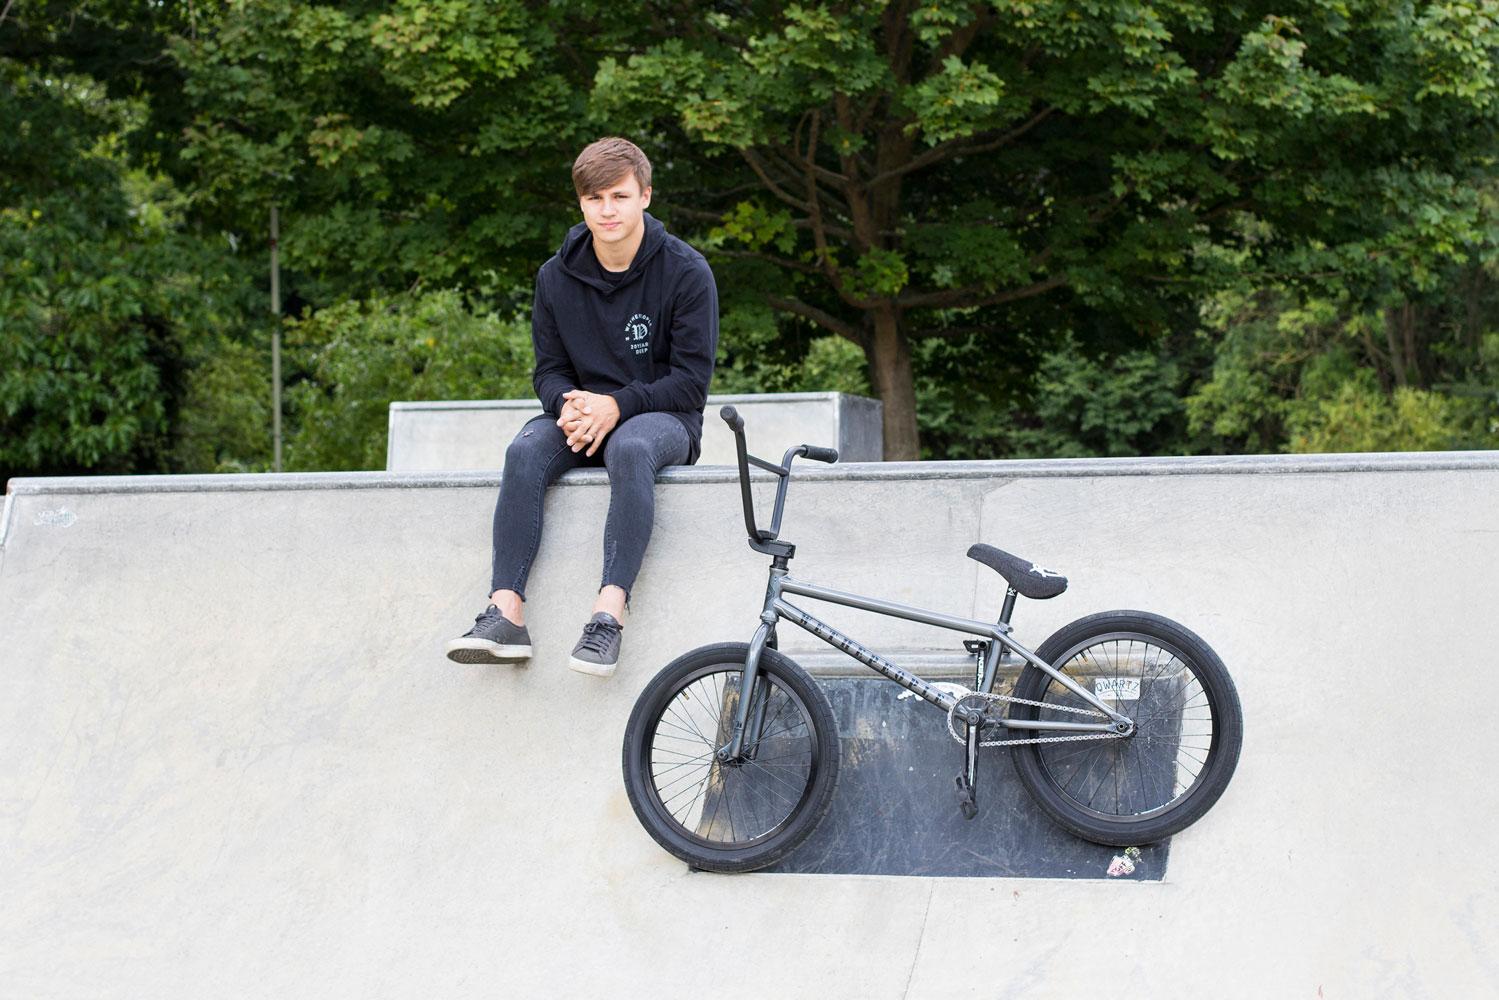 JackM_Bike_Side_LR.jpg